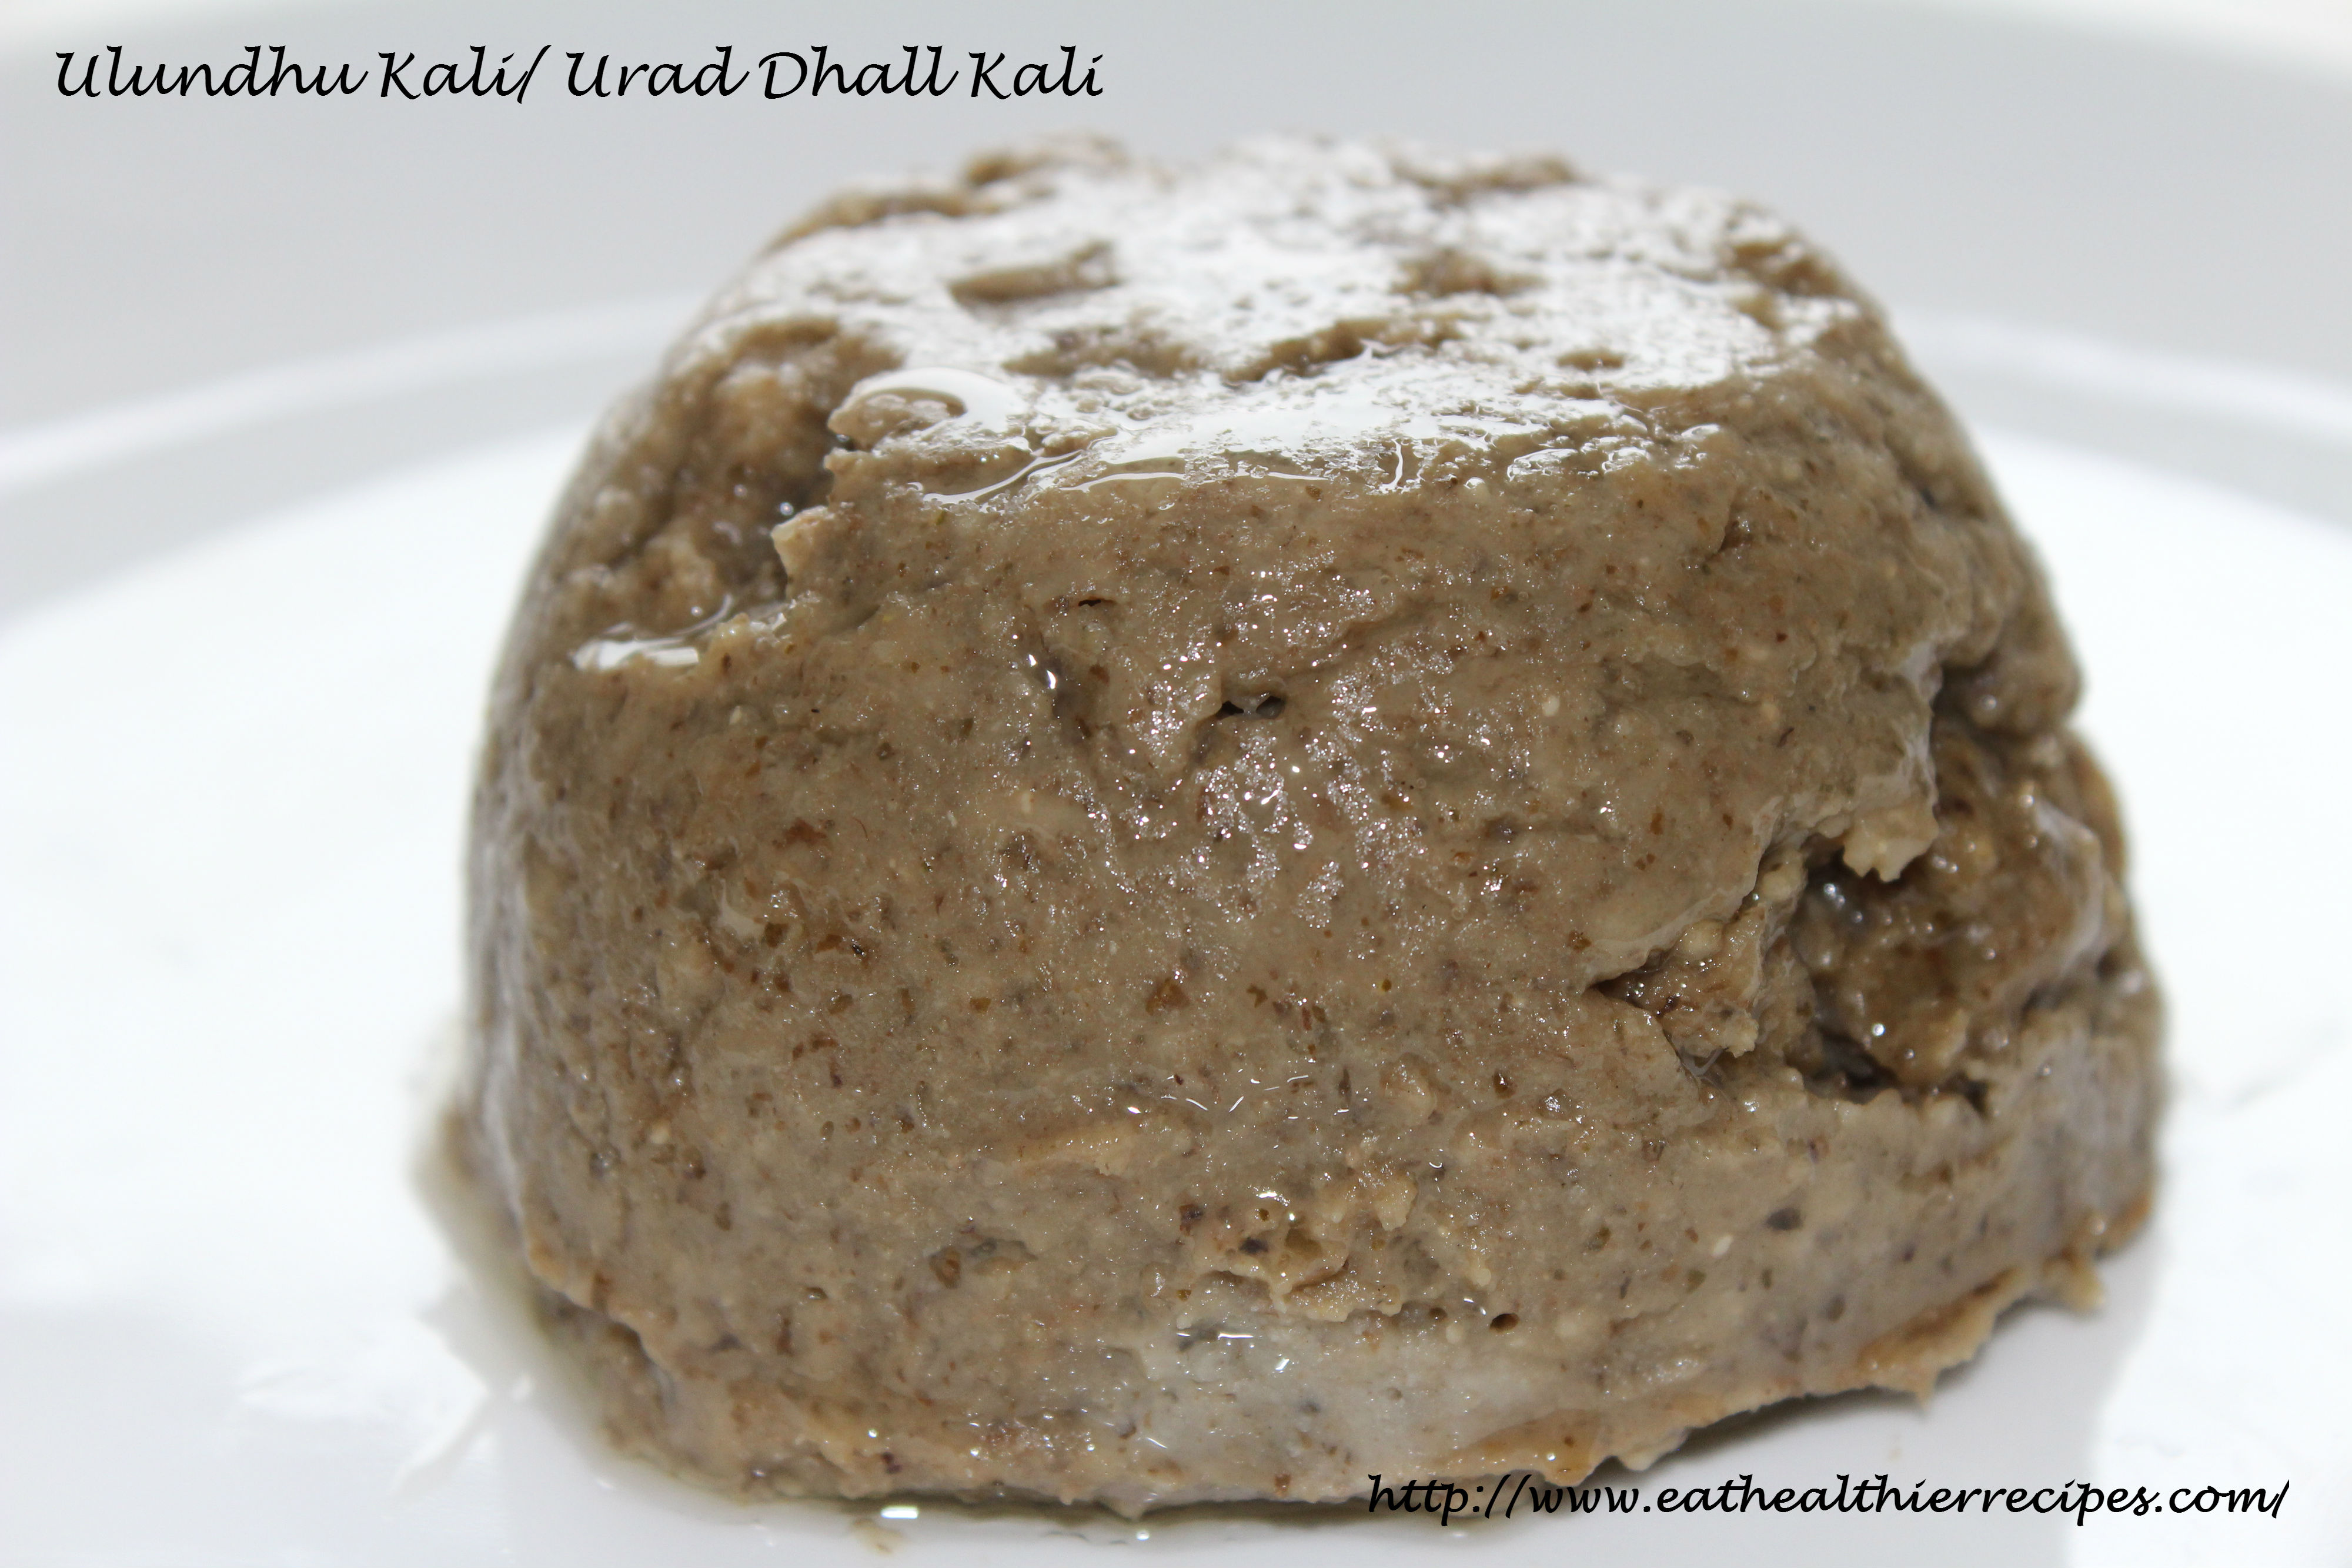 Ulundhu Kali/Urad Dhall Kali